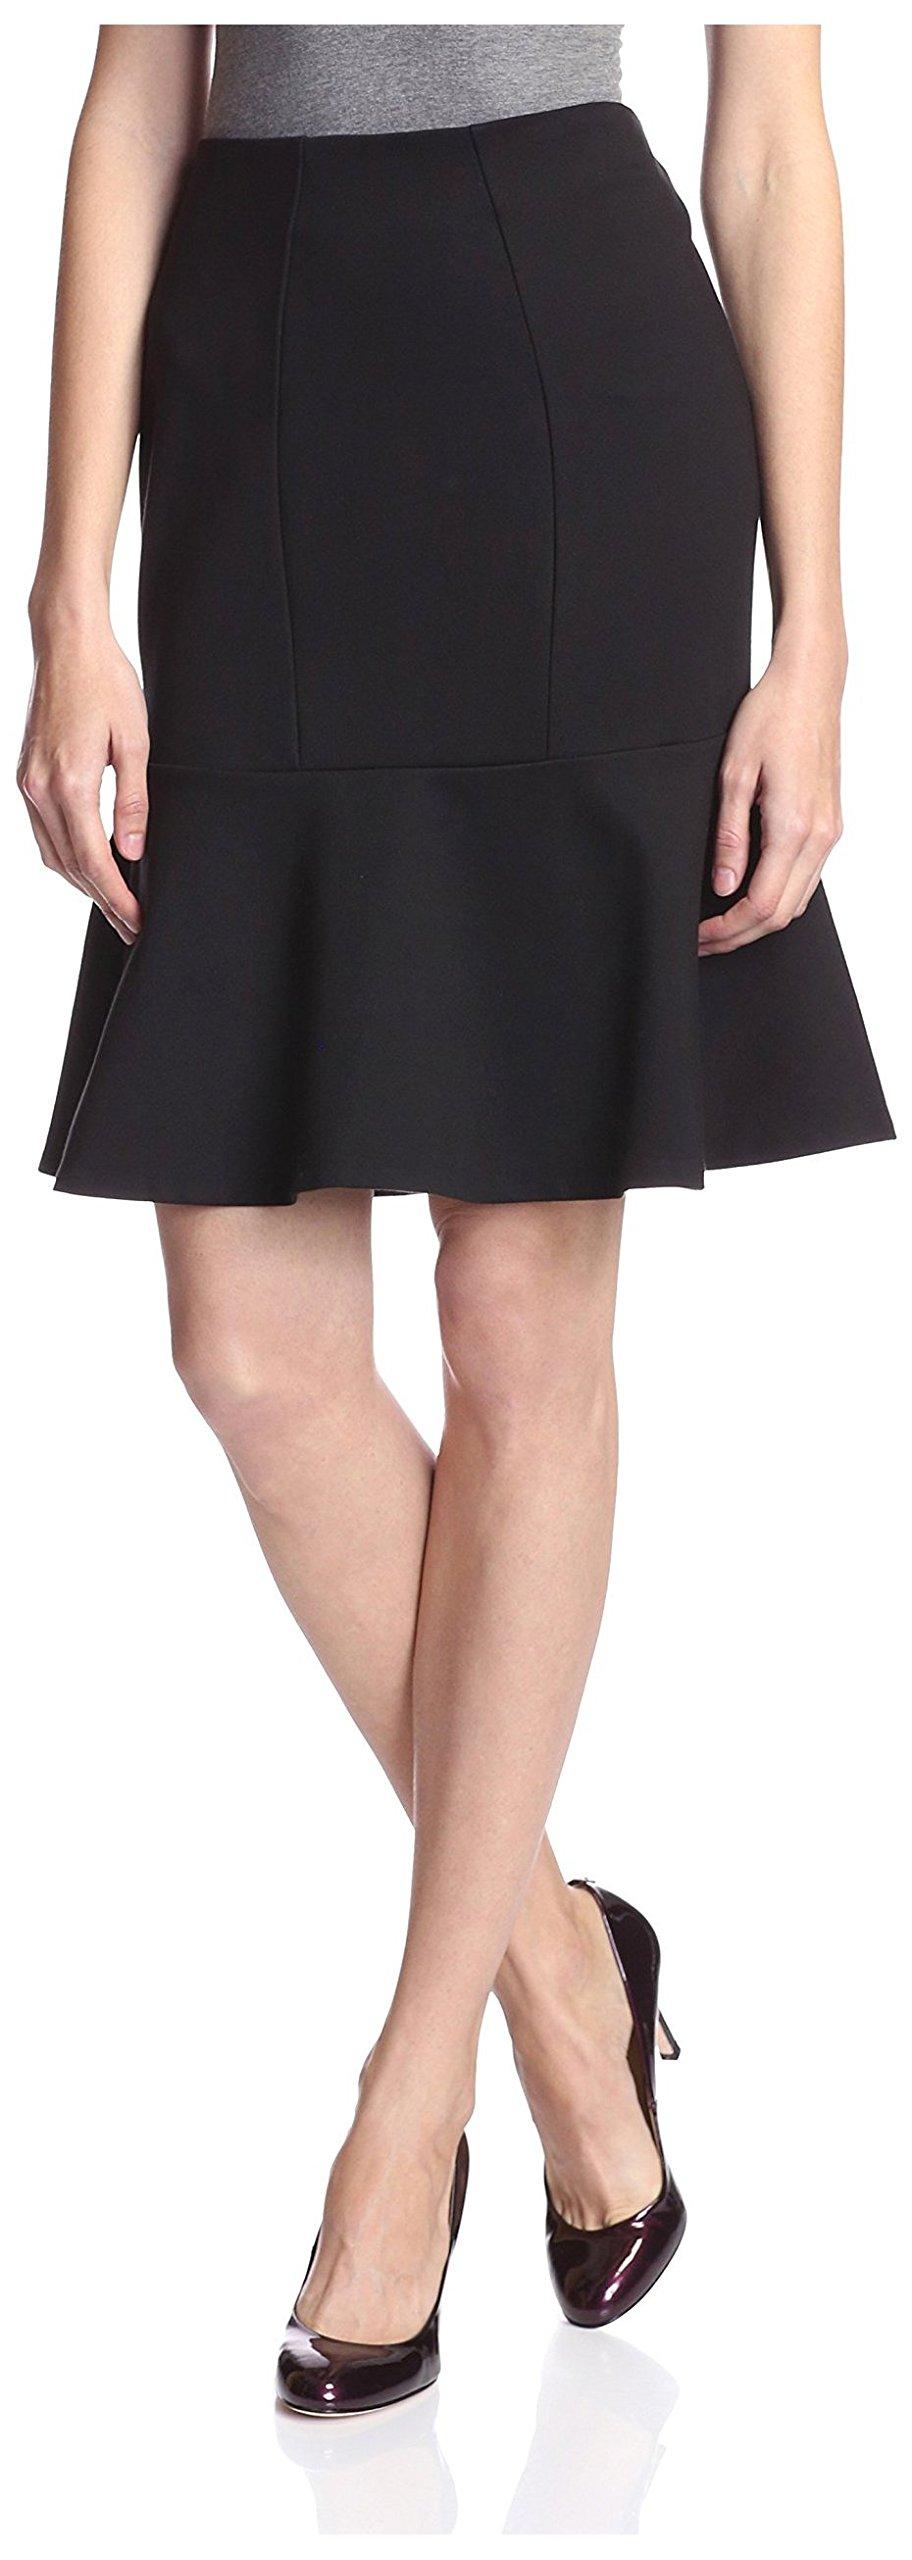 SOCIETY NEW YORK Women's Peplum Skirt, Black, S